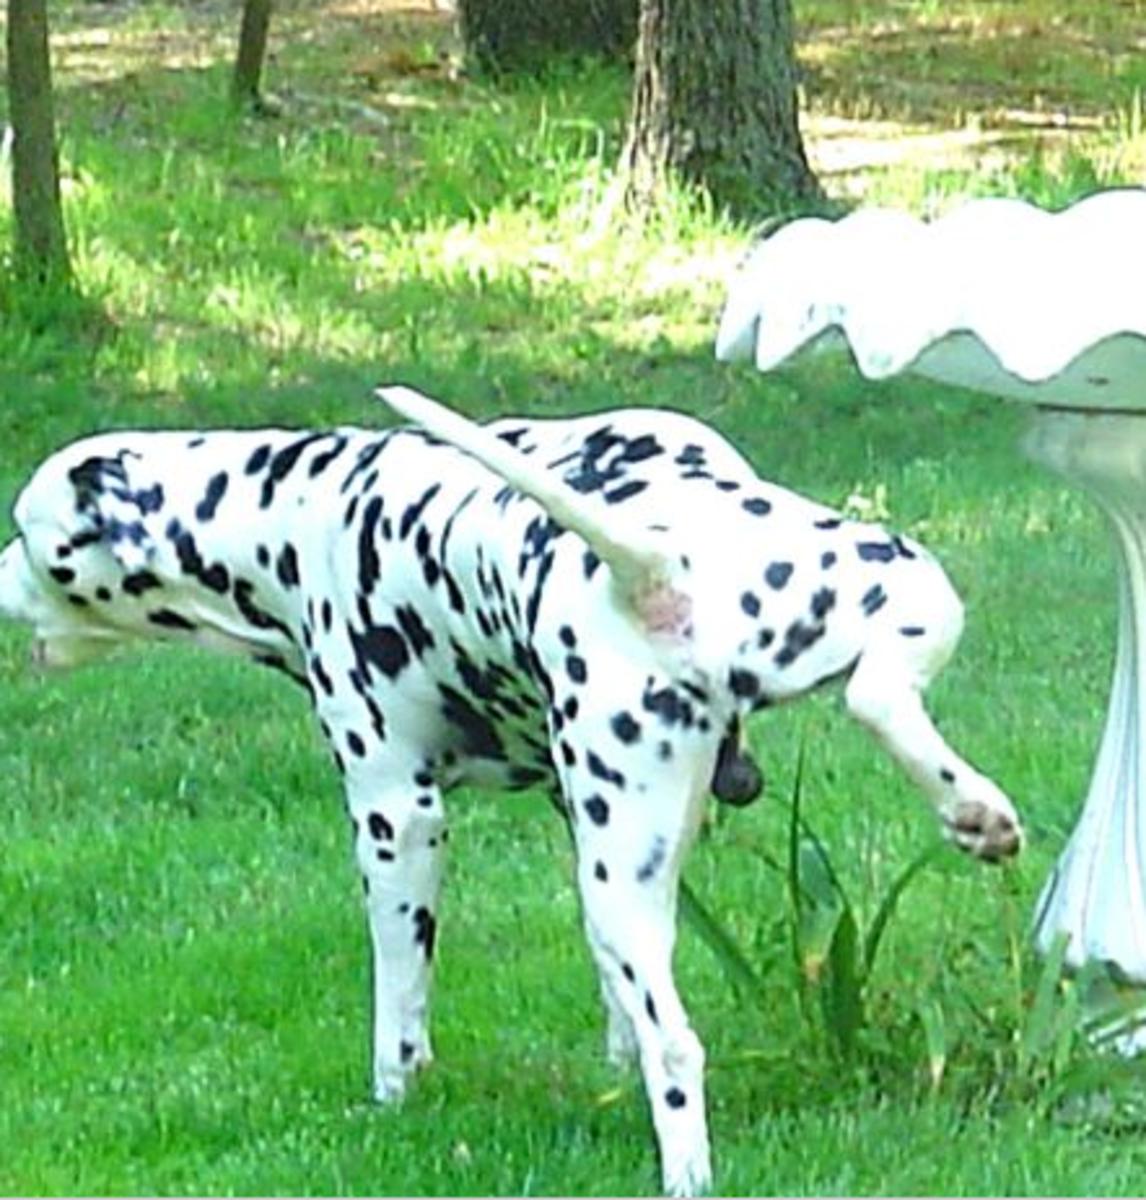 male dog marking